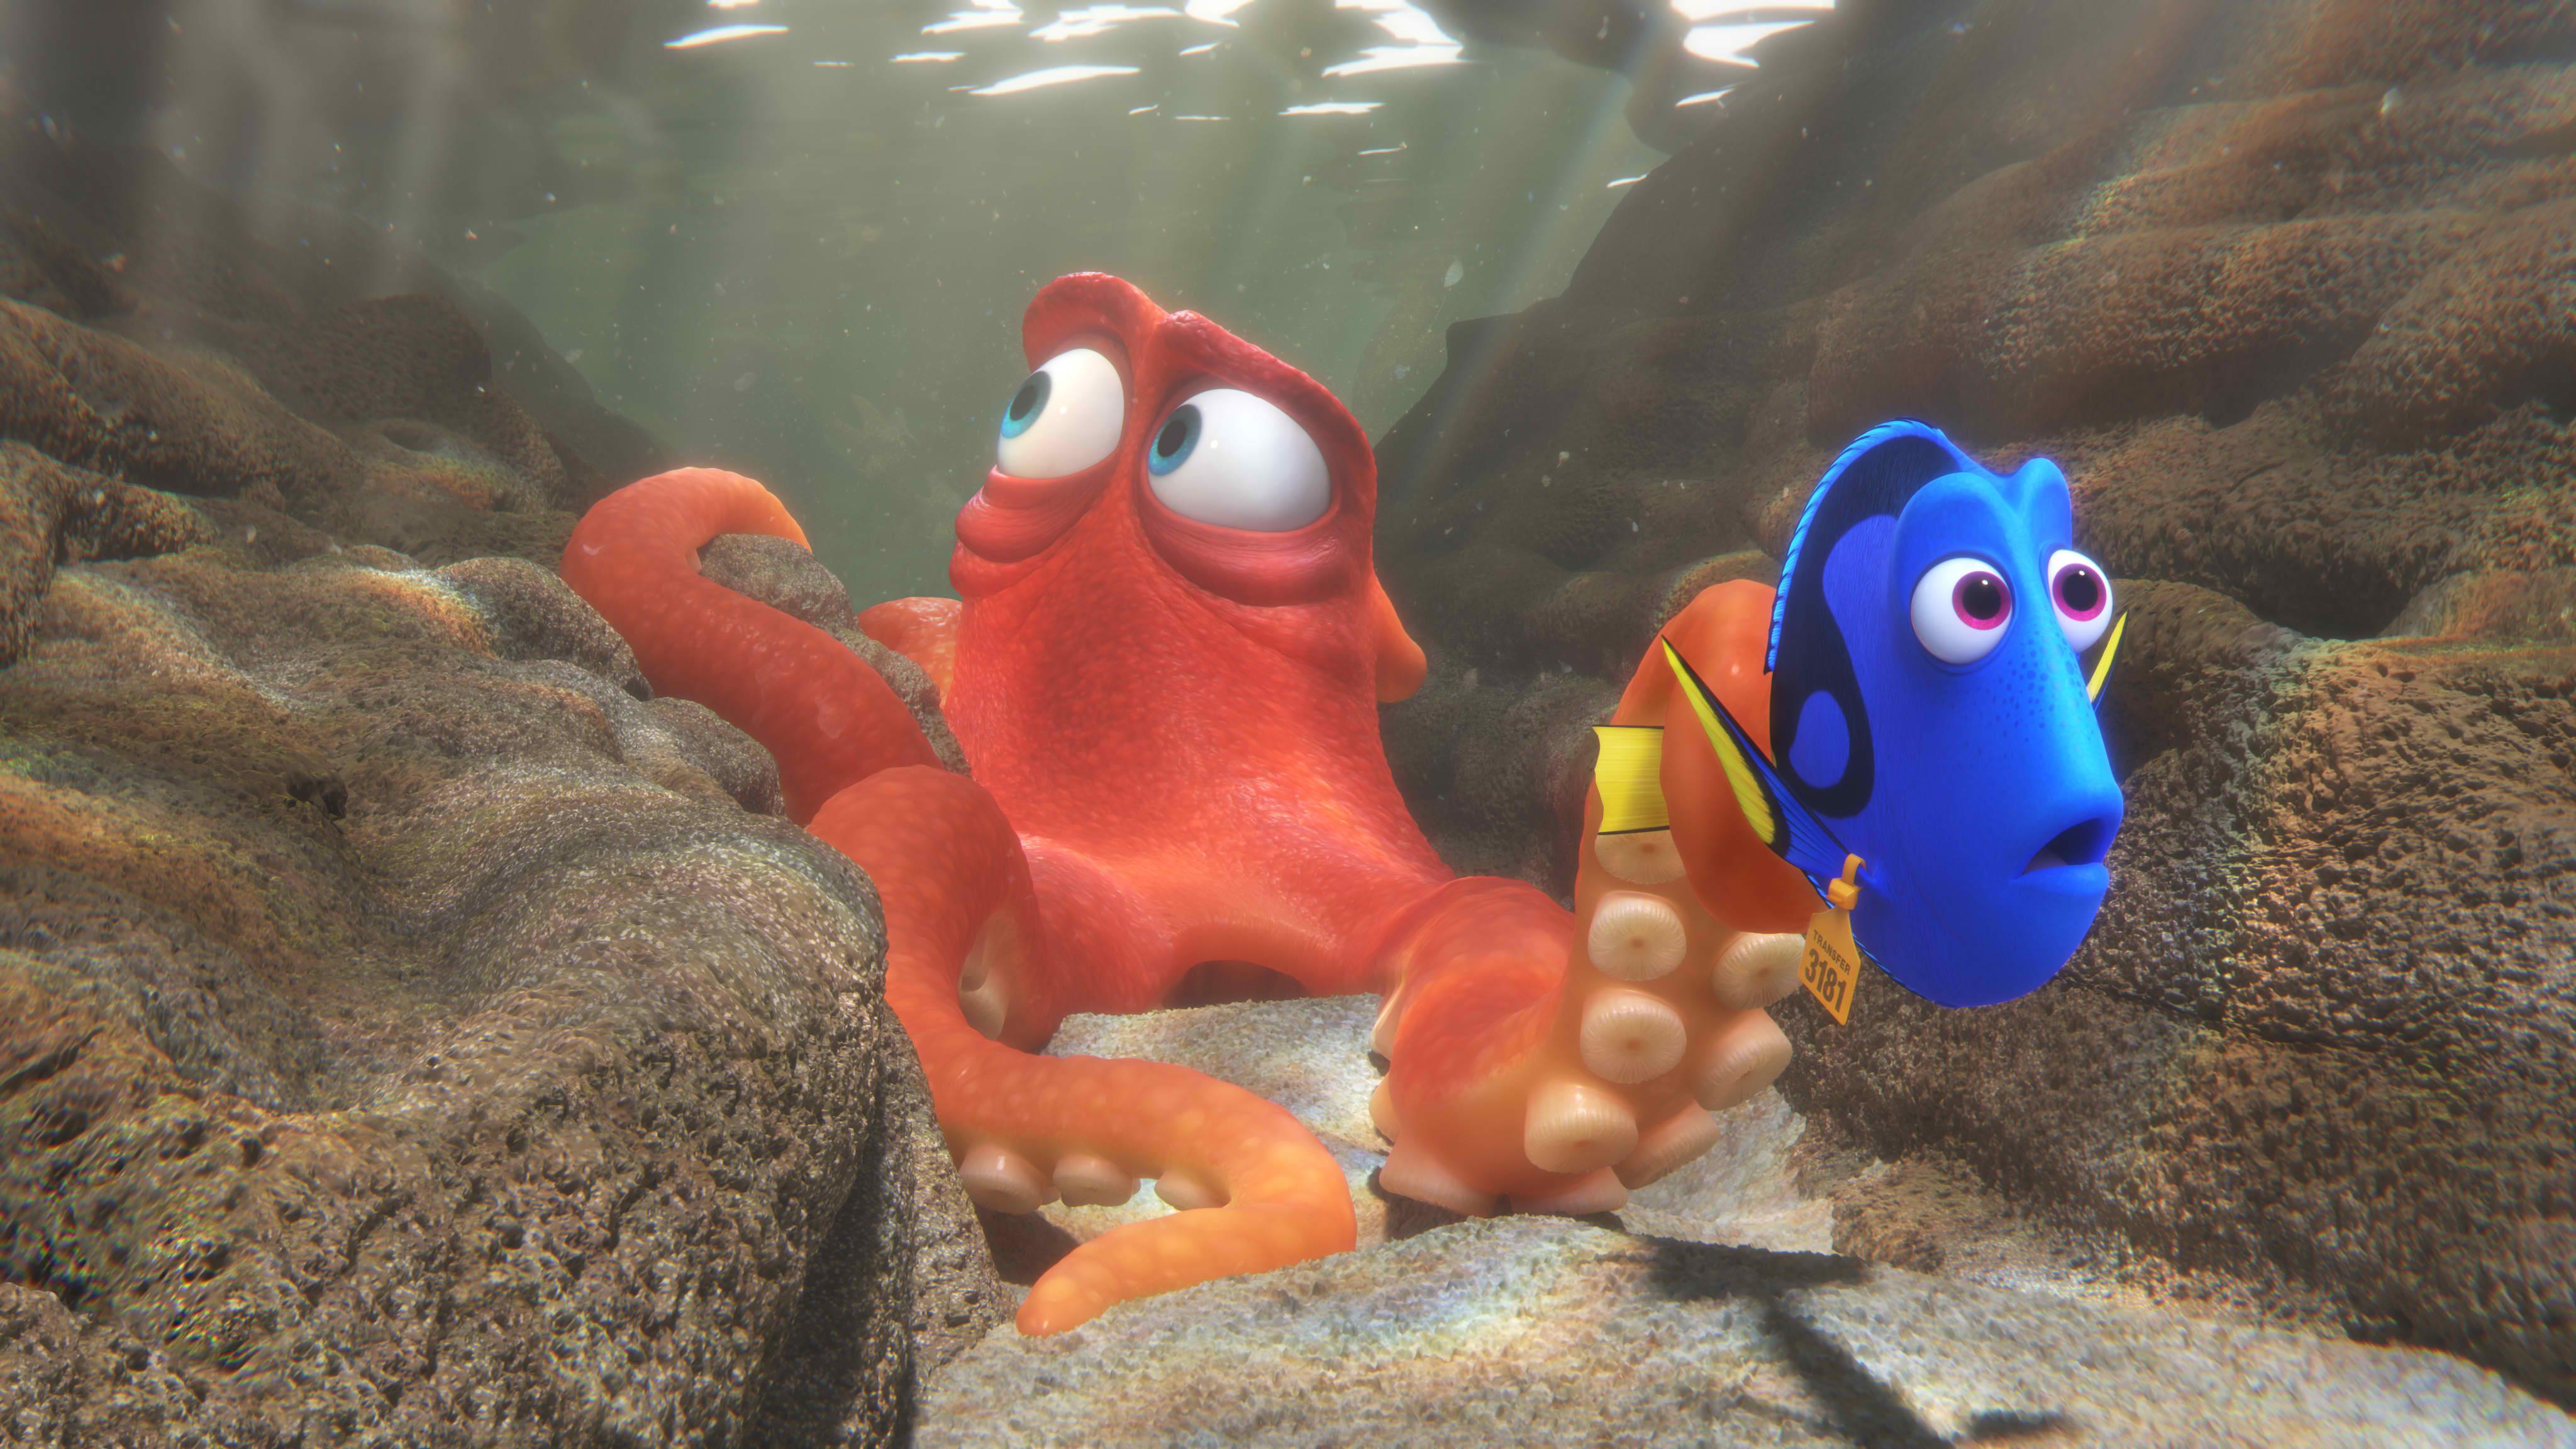 Photo courtesy of Disney Pixar